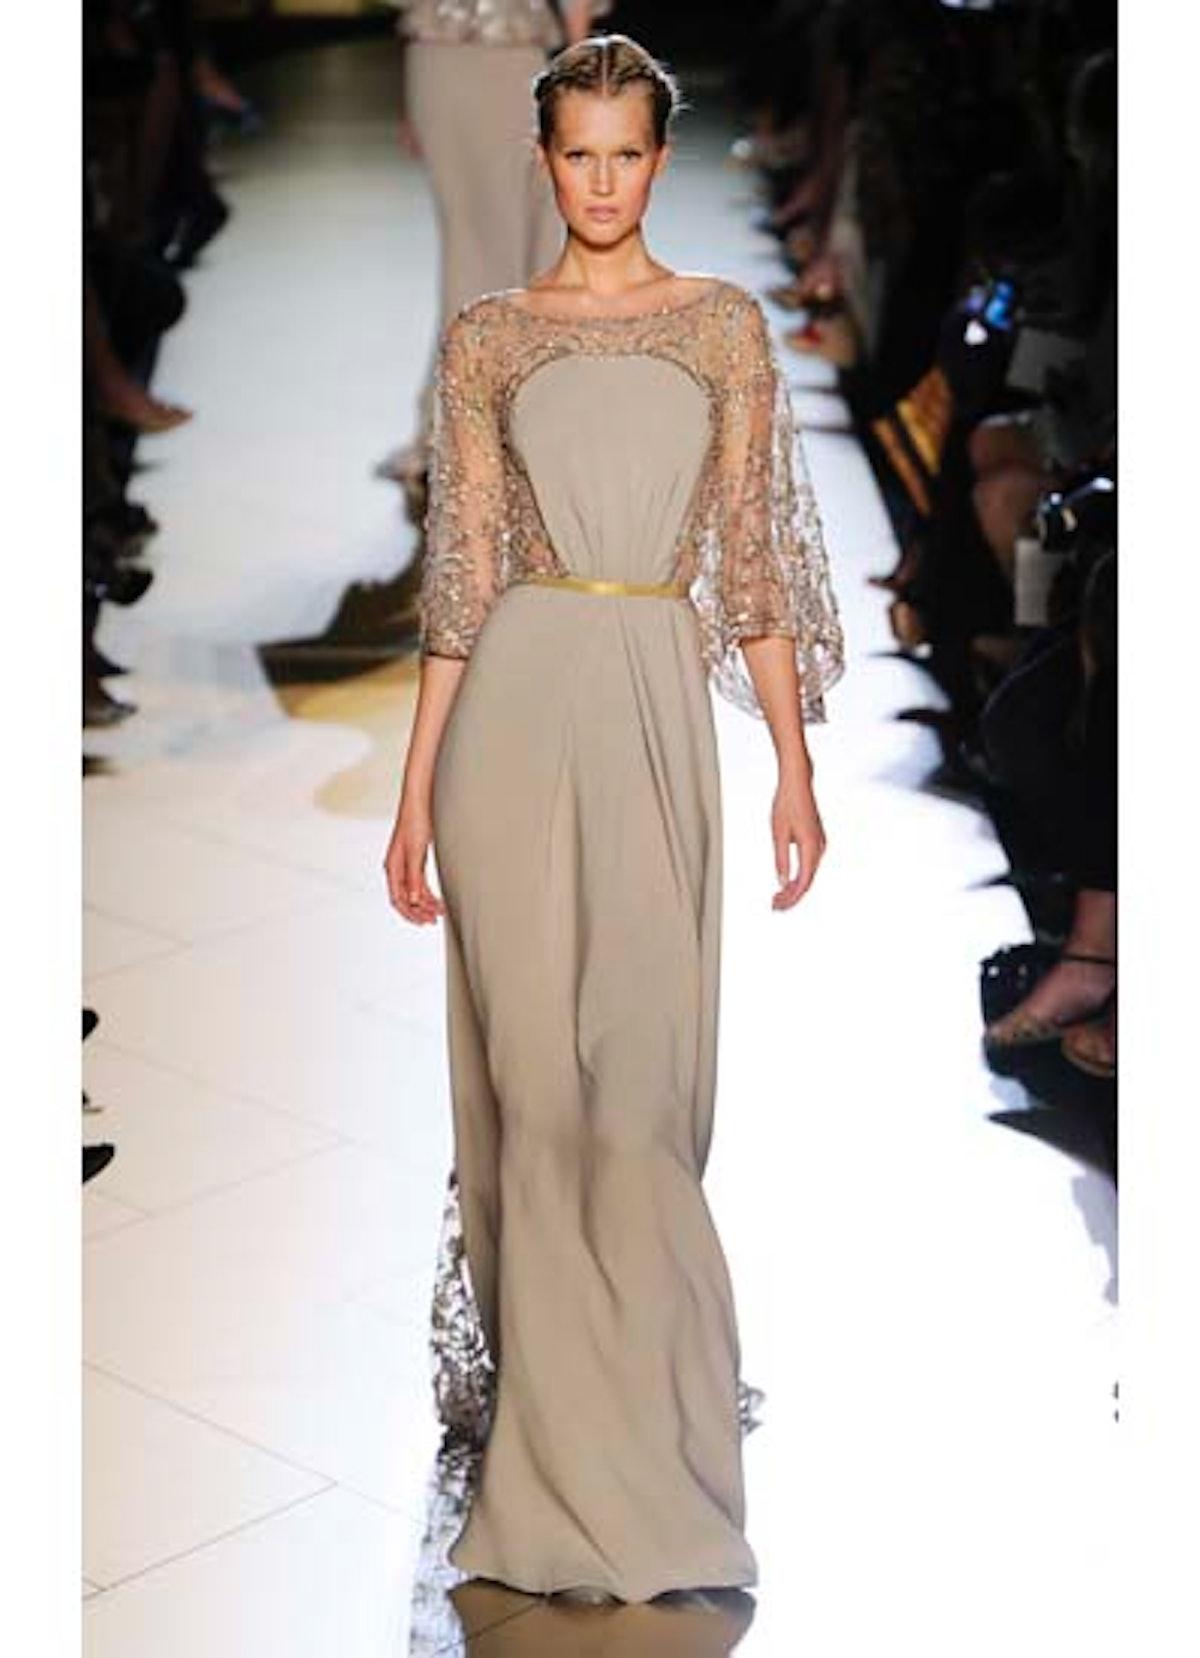 fass-elie-saab-couture-2012-runway-34-v.jpg